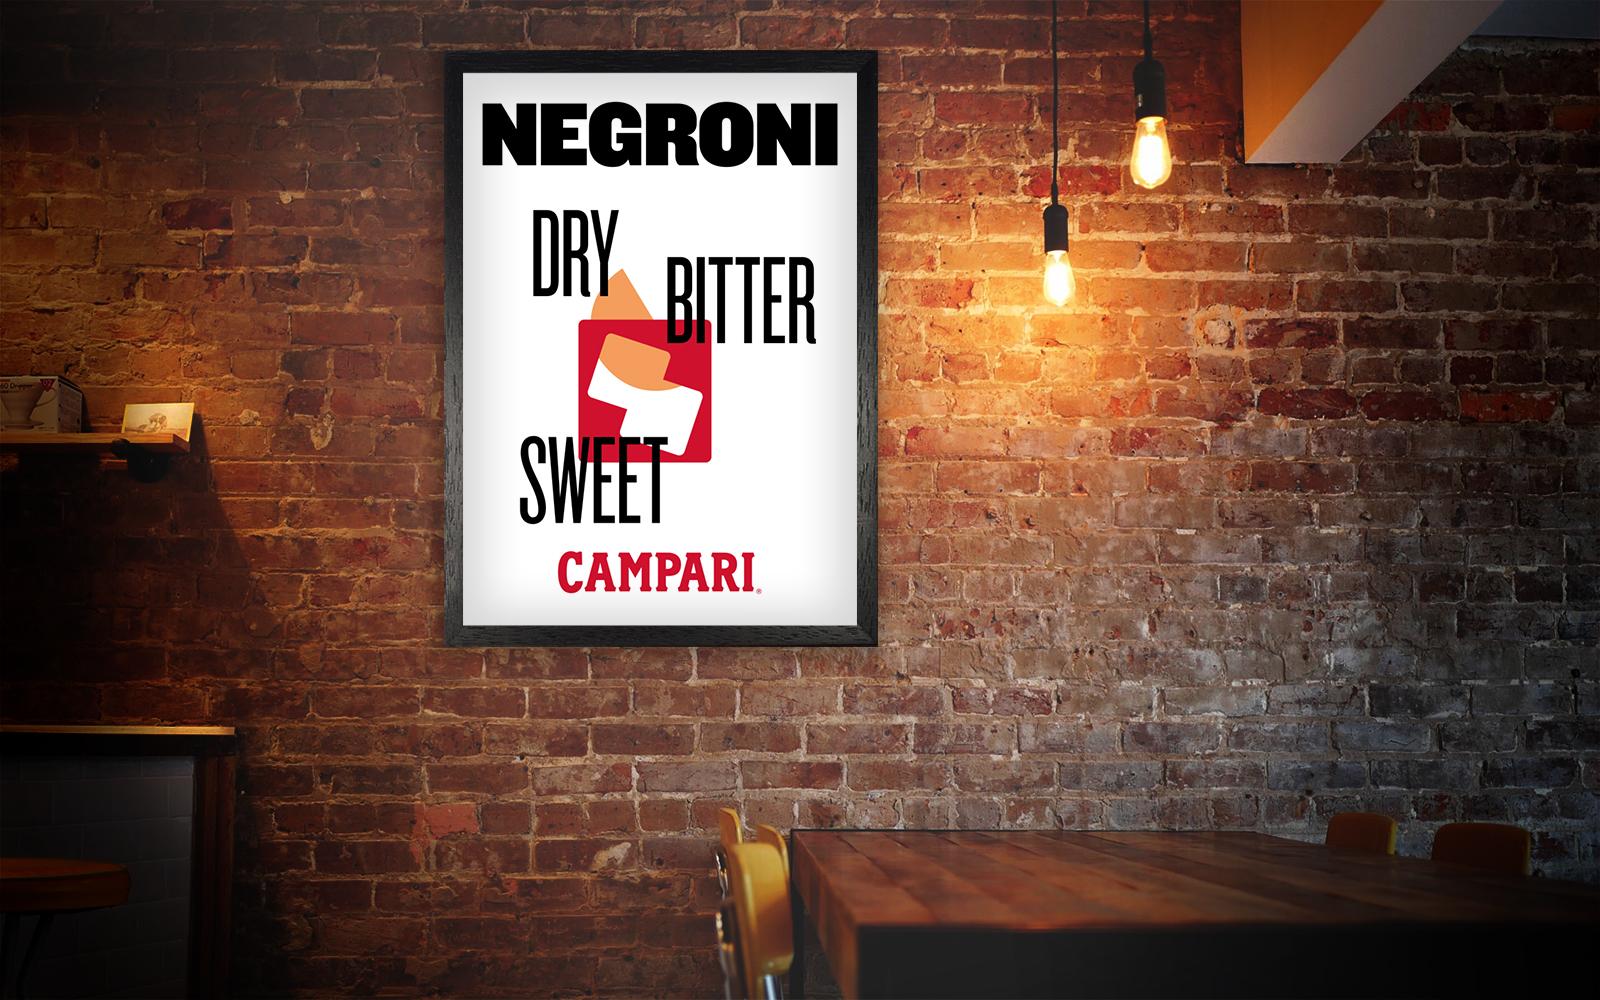 Campari Negroni Lightbox   By James-Lee Duffy